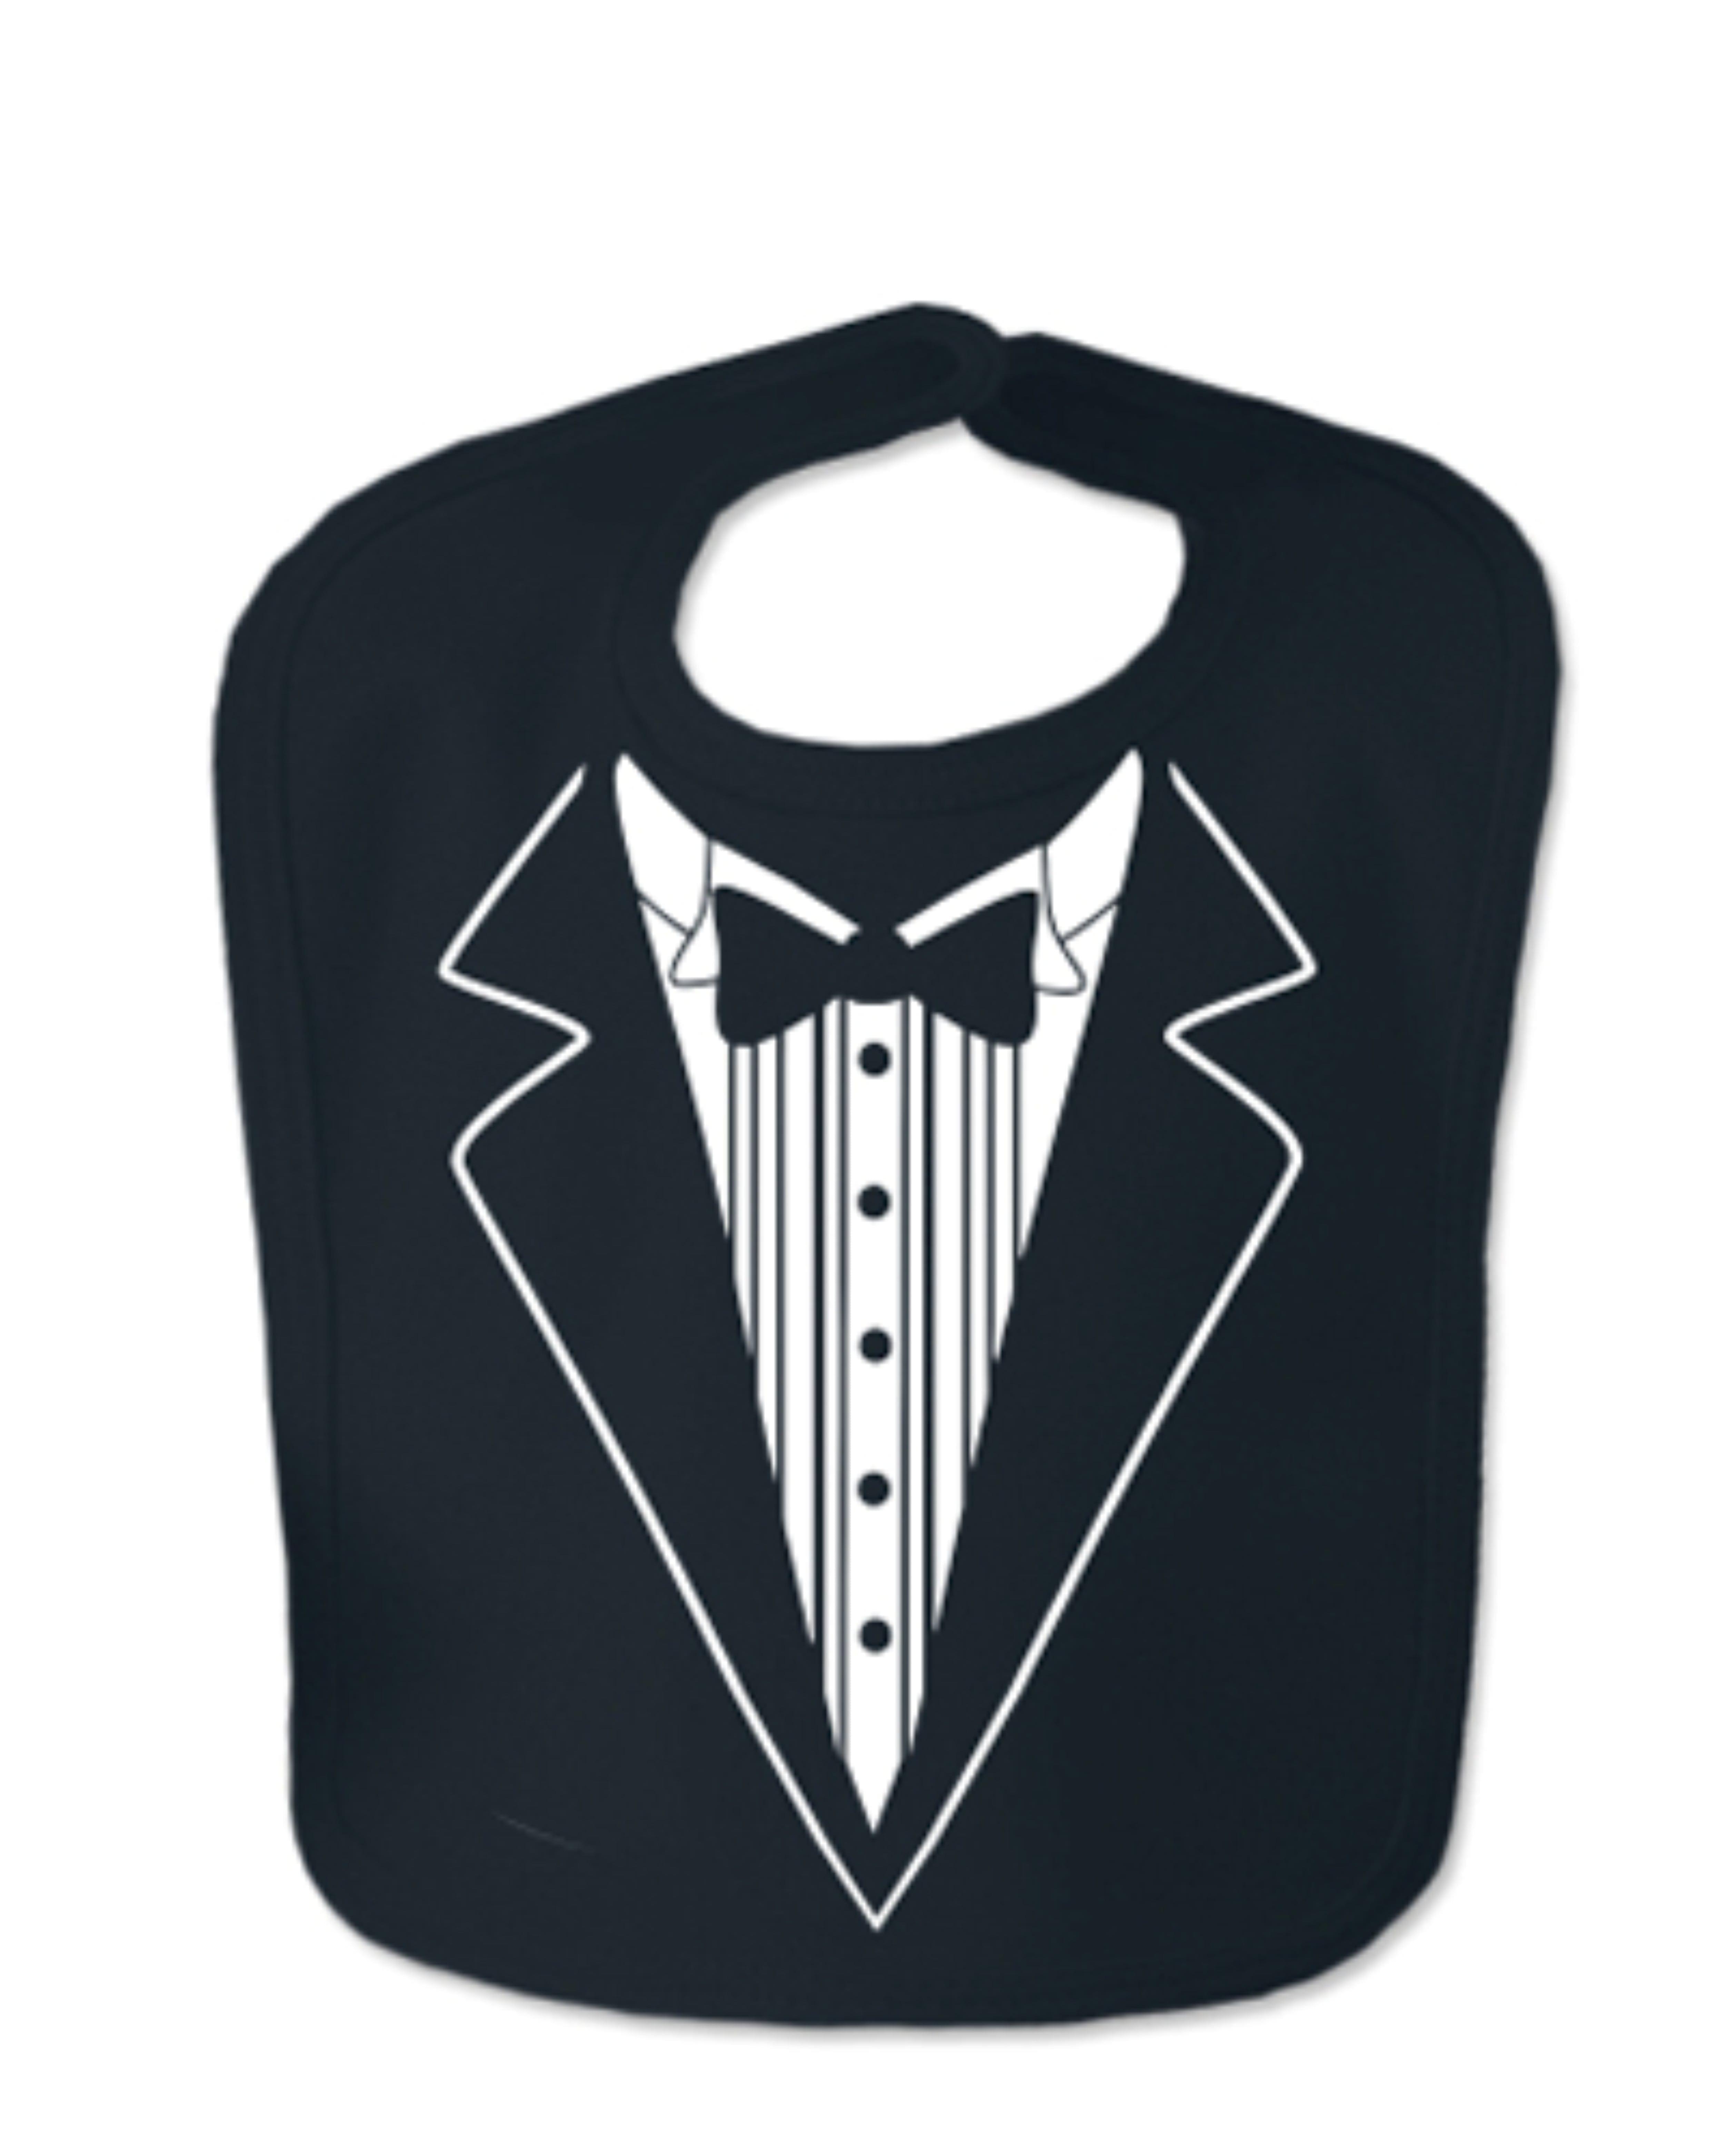 Black Tuxedo Velcro Baby Bib